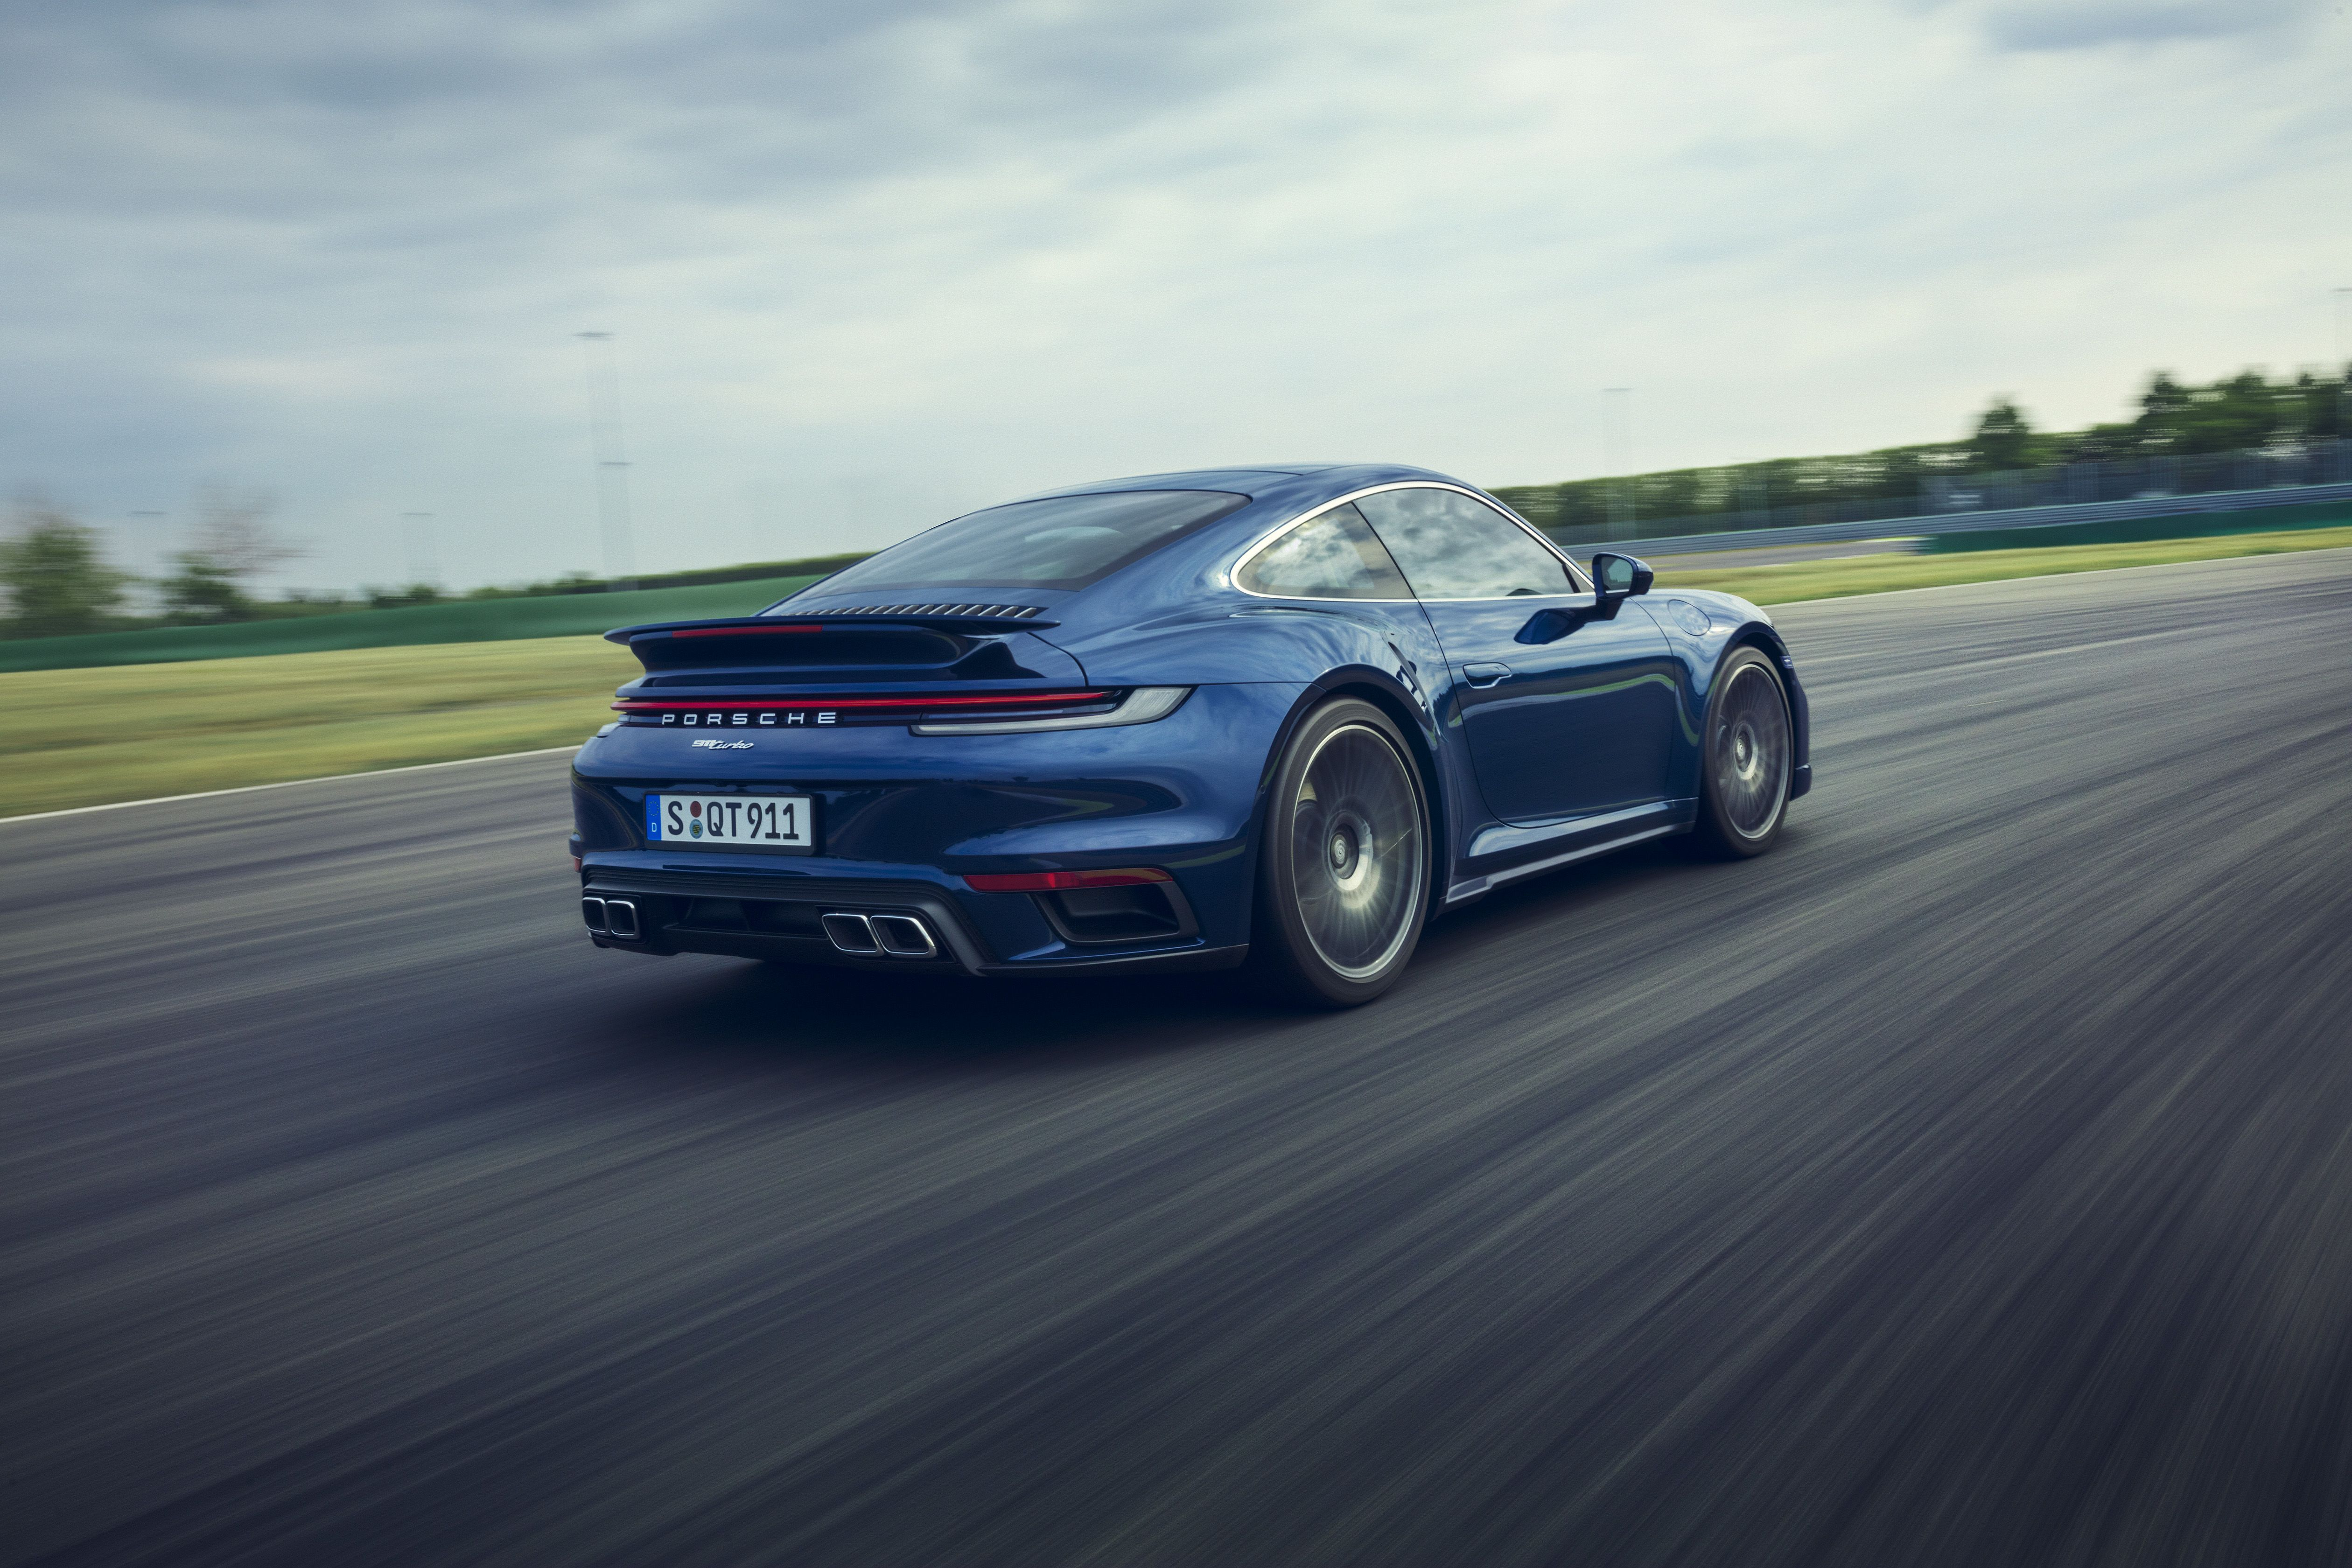 2021 Porsche 911 Turbo Is On Par With The Previous Gen Turbo S